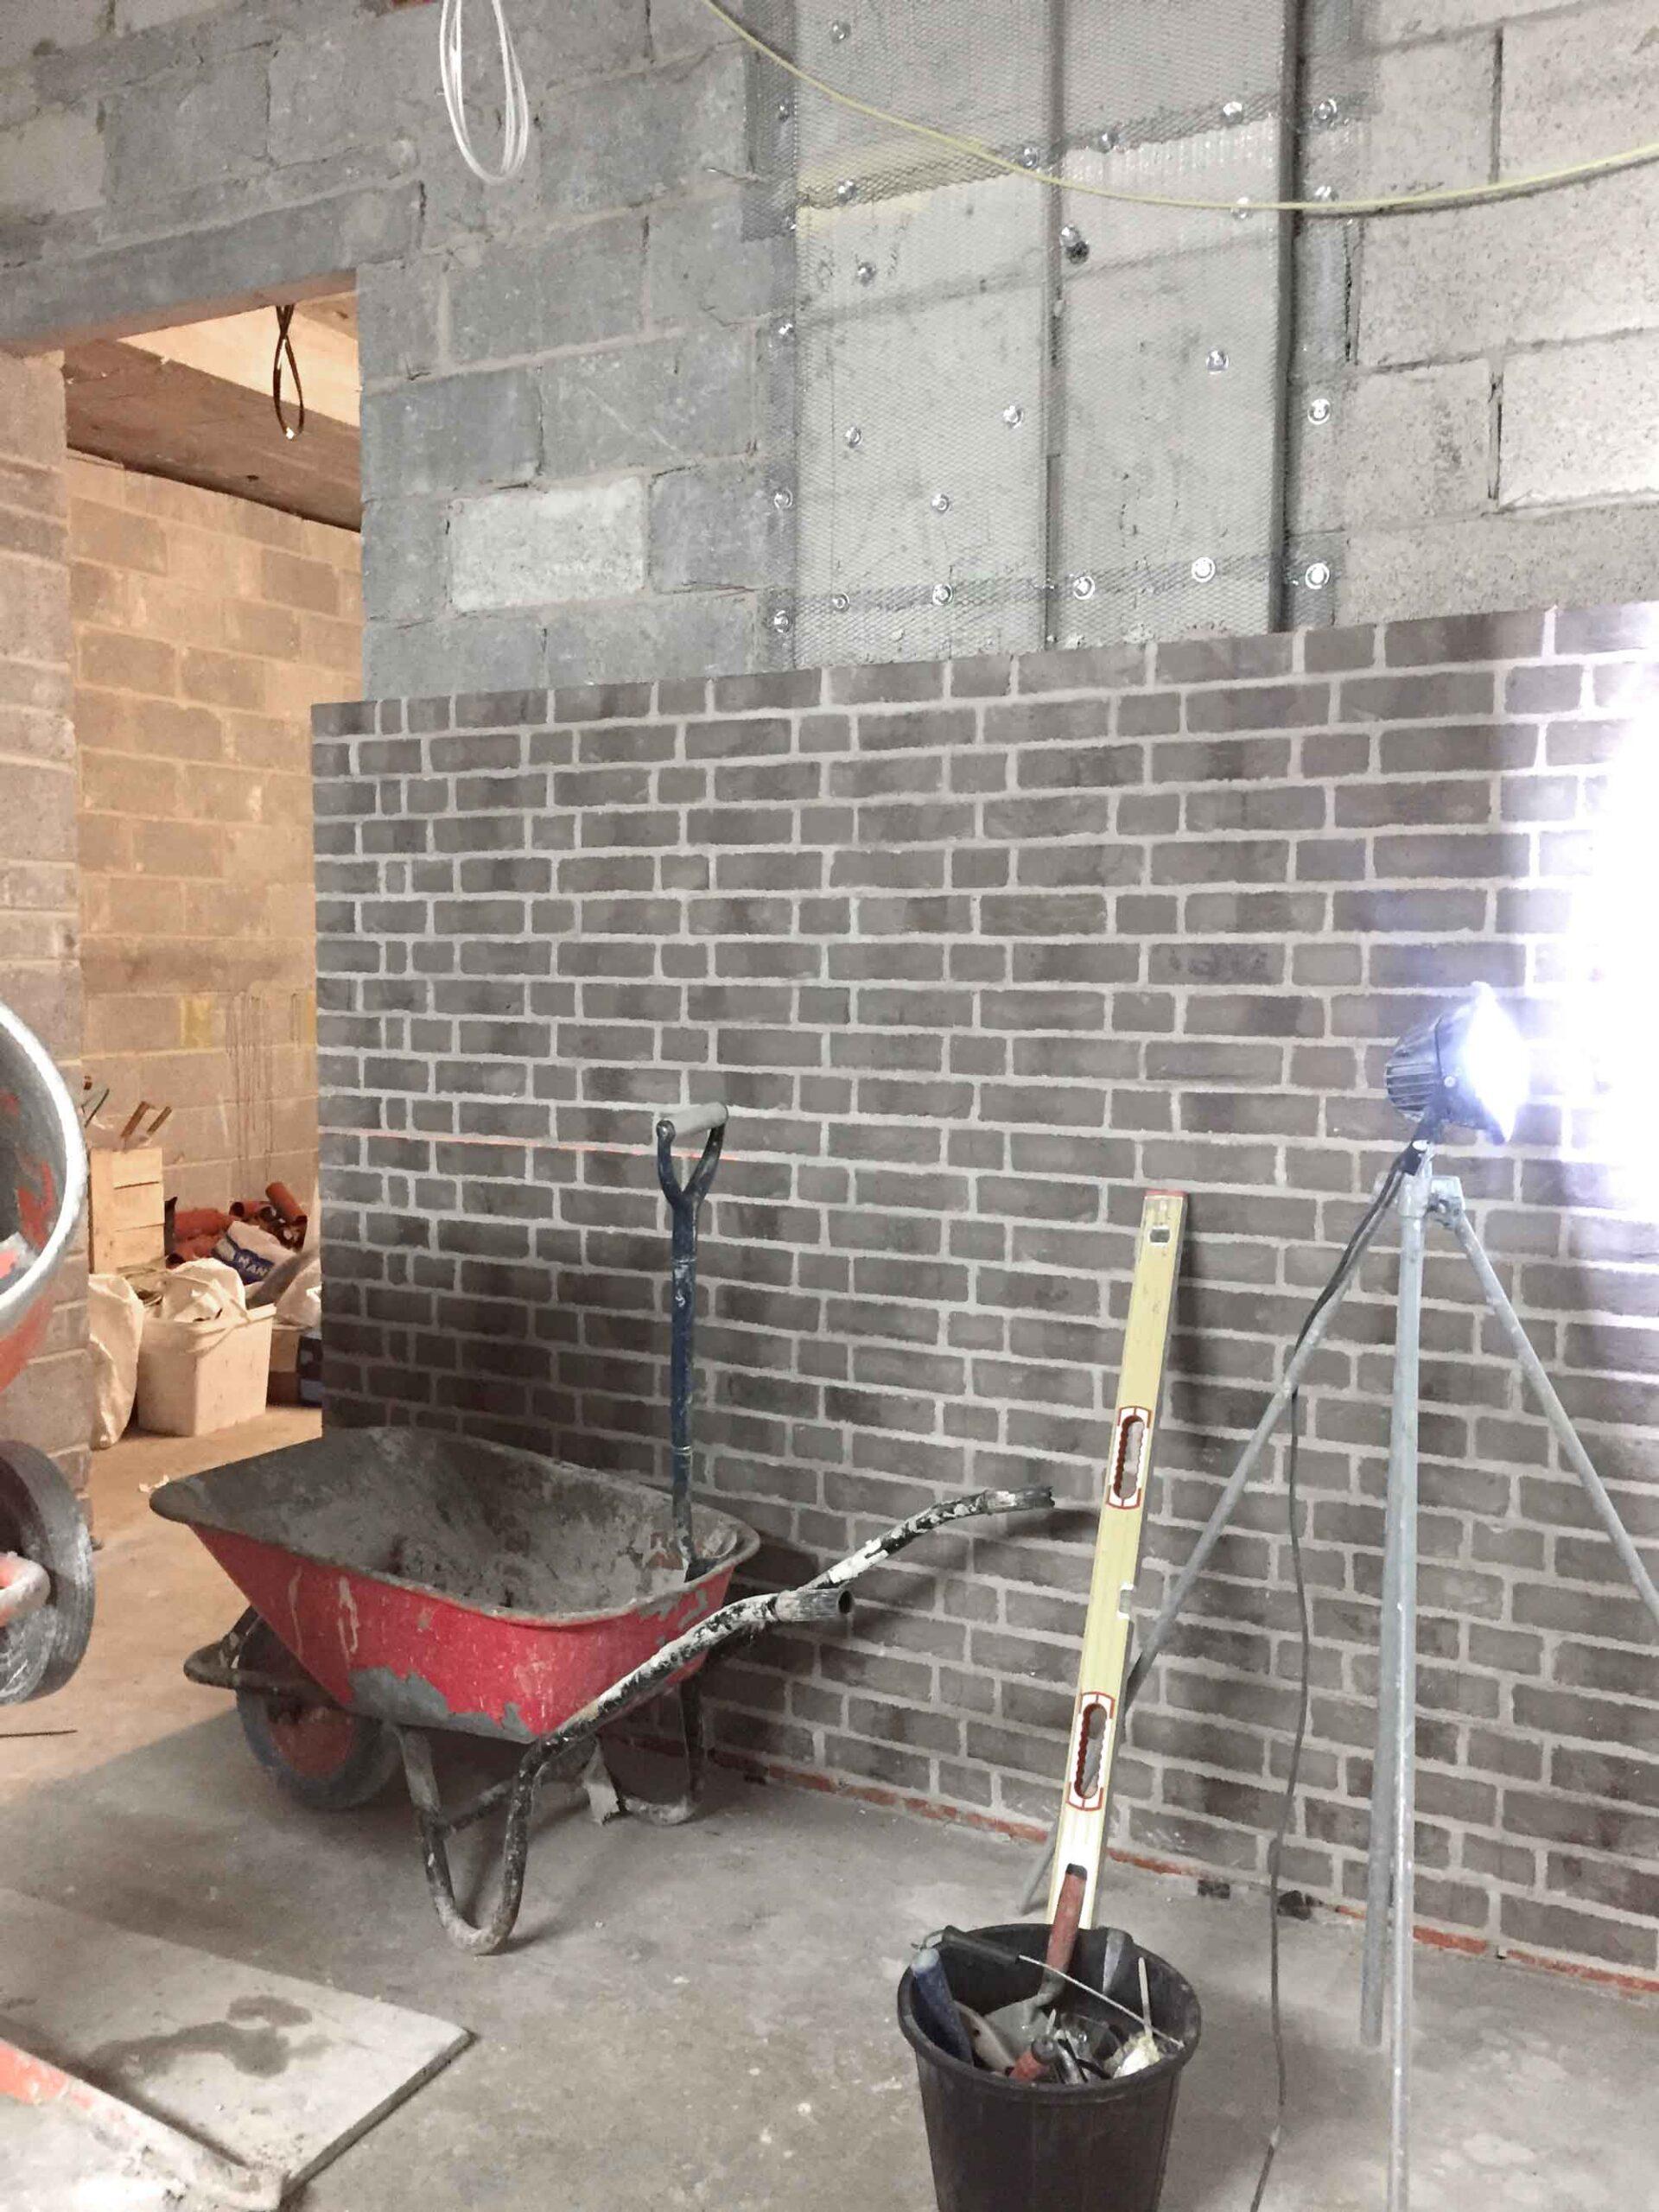 kensington-house-openstudio-architects-brick-wall-details